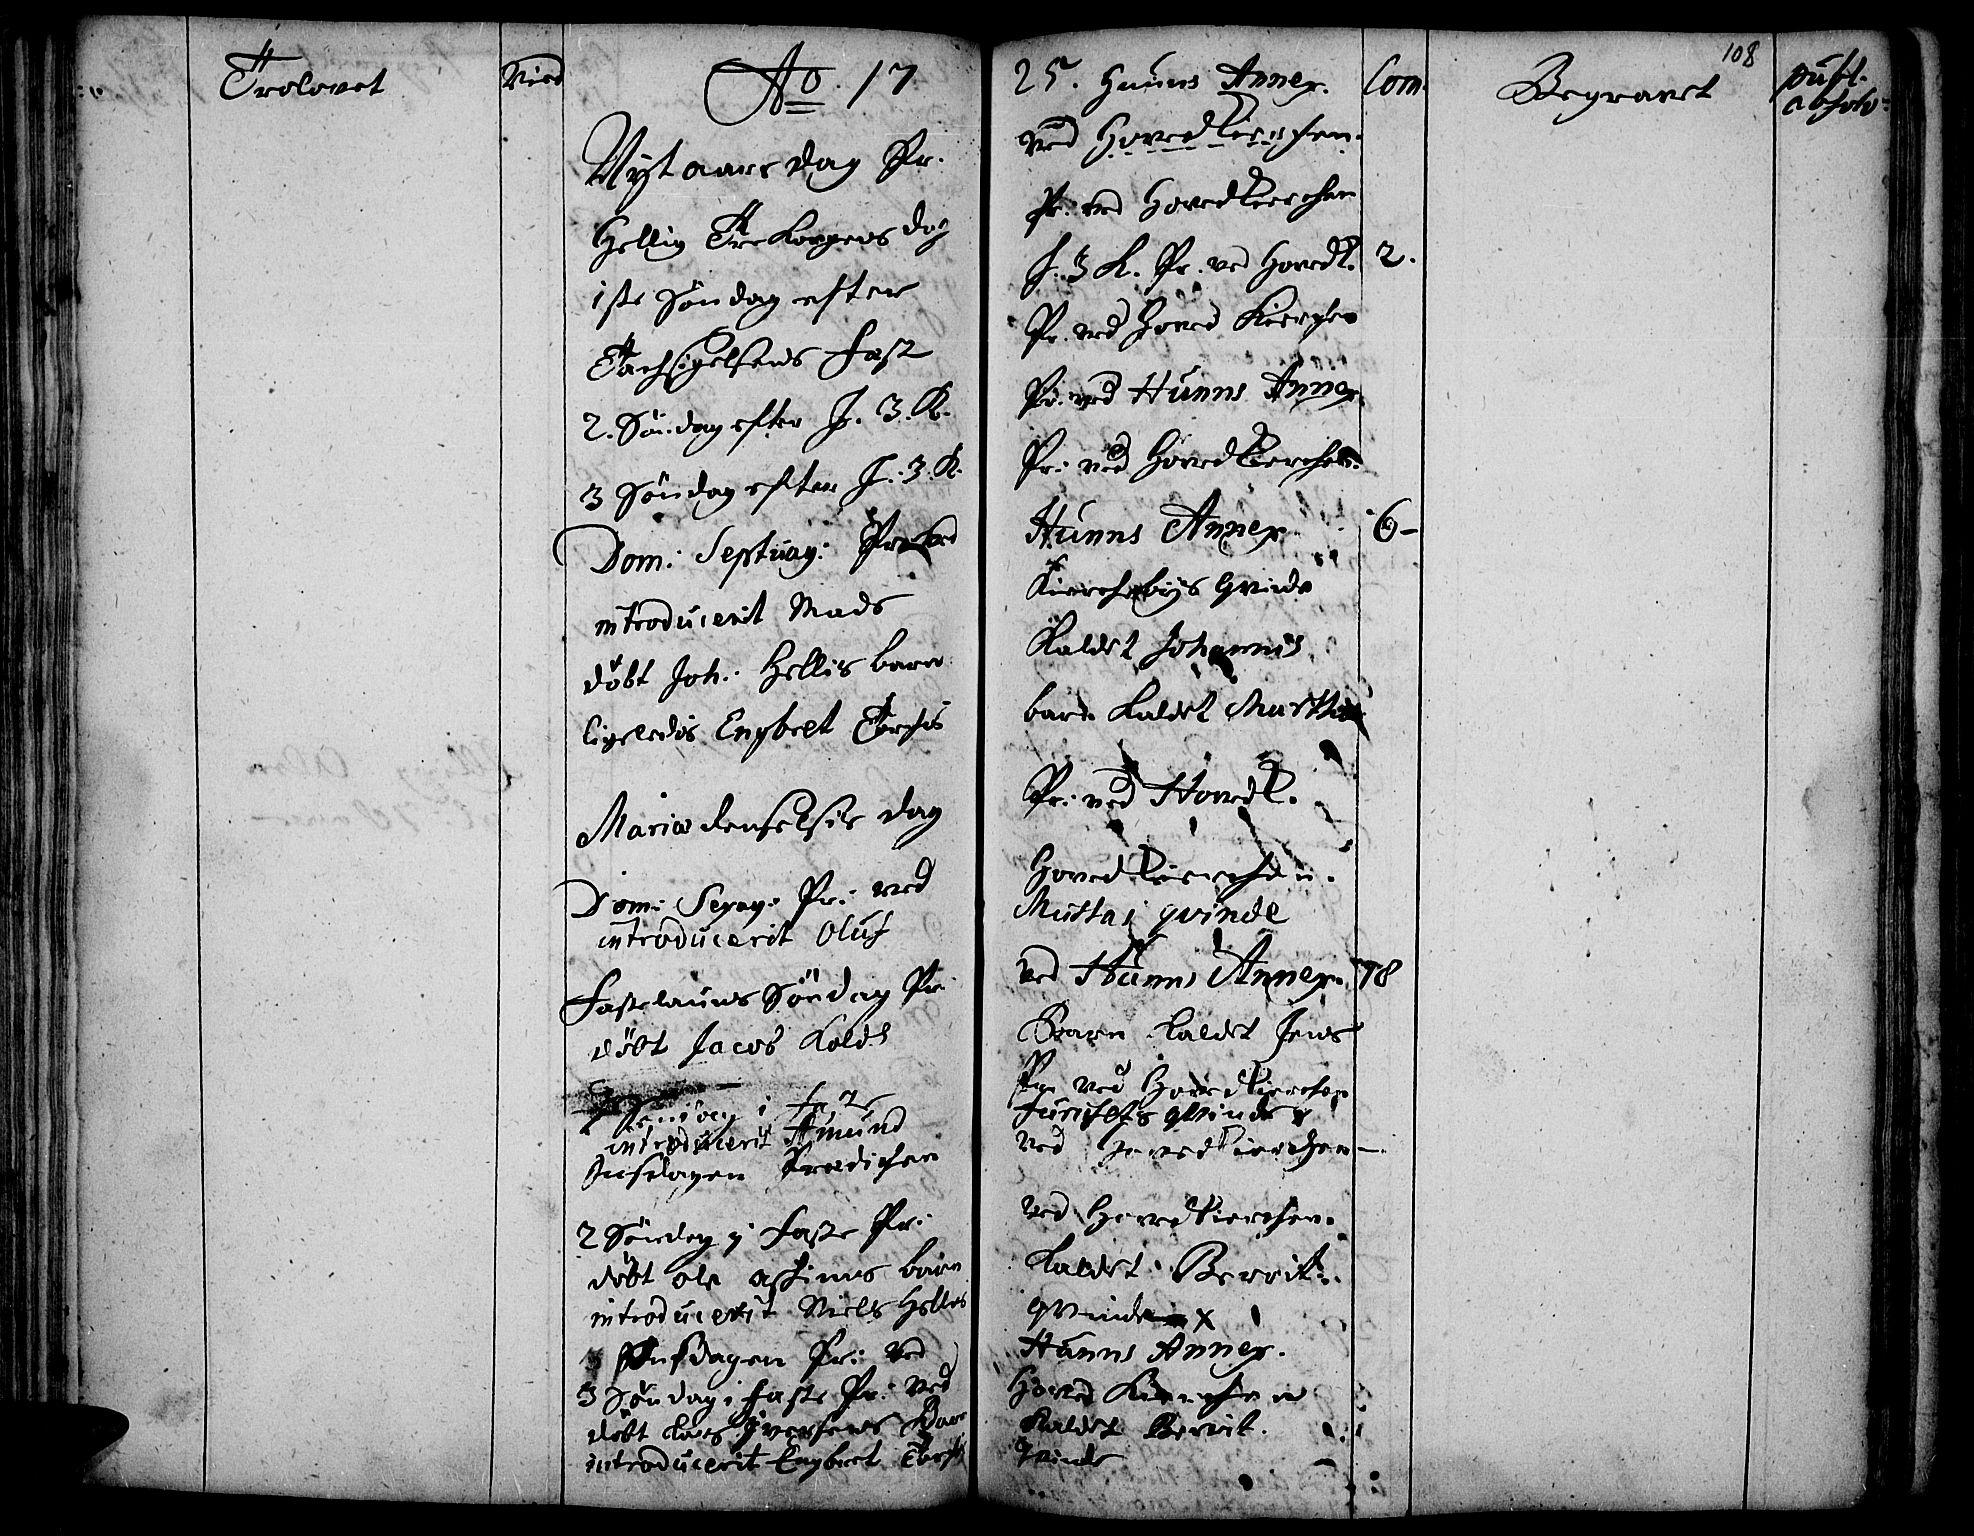 SAH, Vardal prestekontor, H/Ha/Haa/L0001: Ministerialbok nr. 1, 1706-1748, s. 108